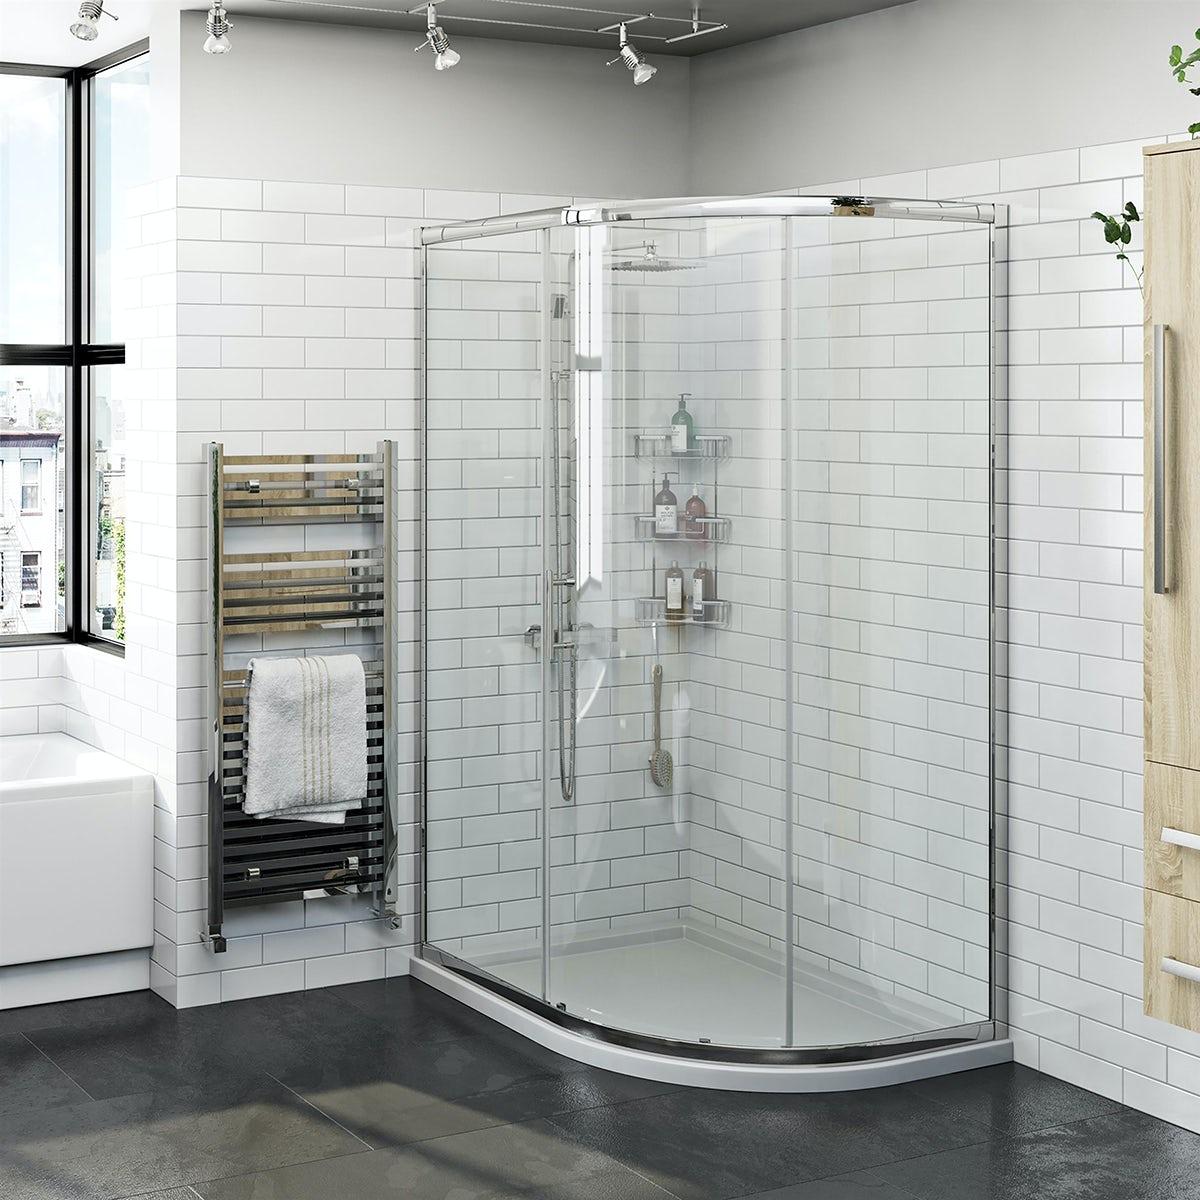 Delicieux Orchard 6mm One Door Offset Quadrant Shower Enclosure